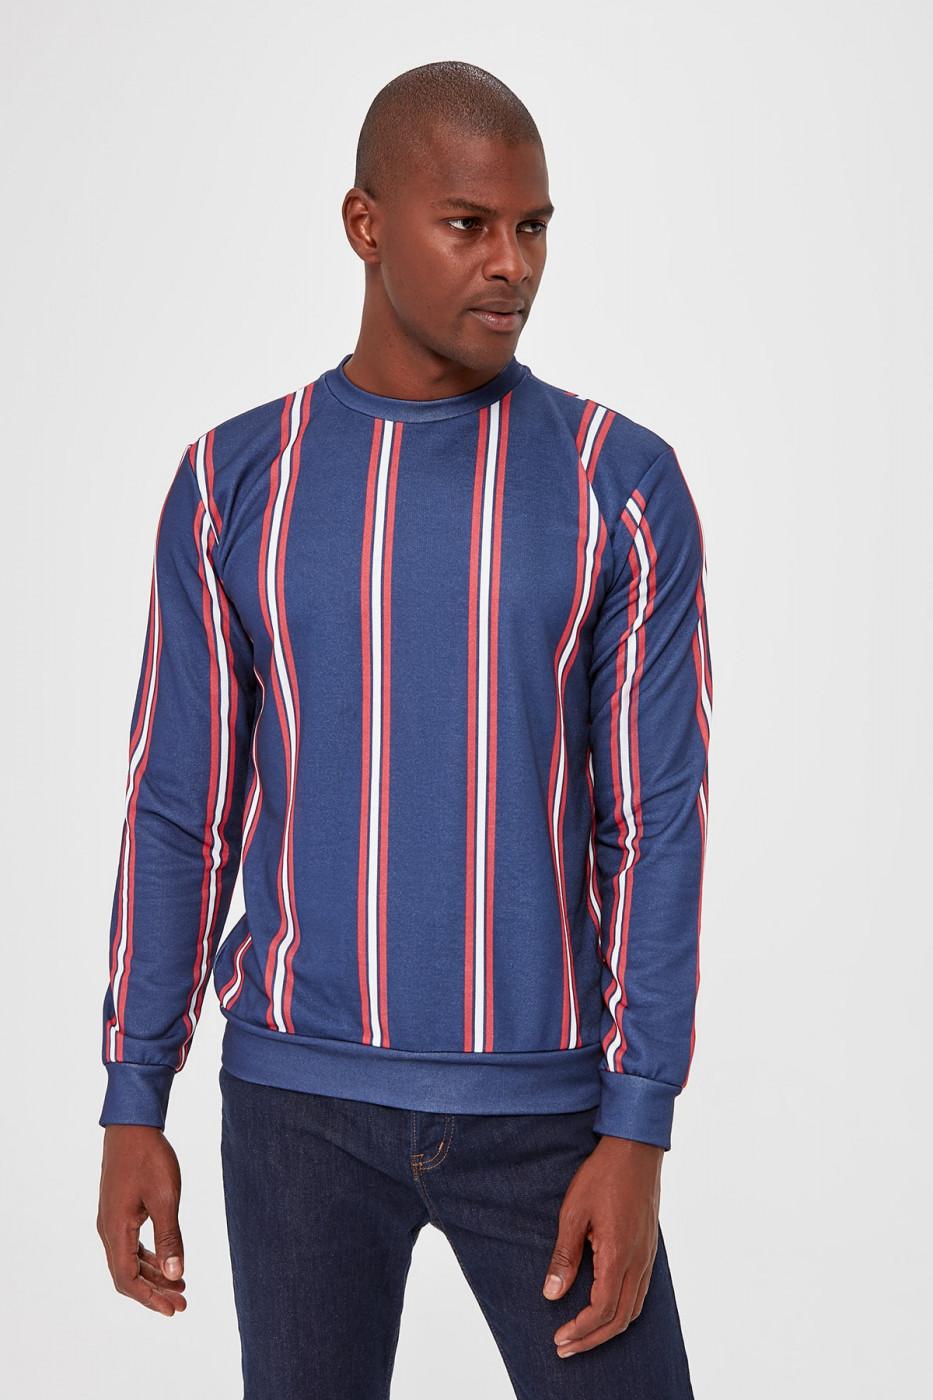 Trendyol Navy Blue Men's Bicycle Collar Striped New Sweatshirt